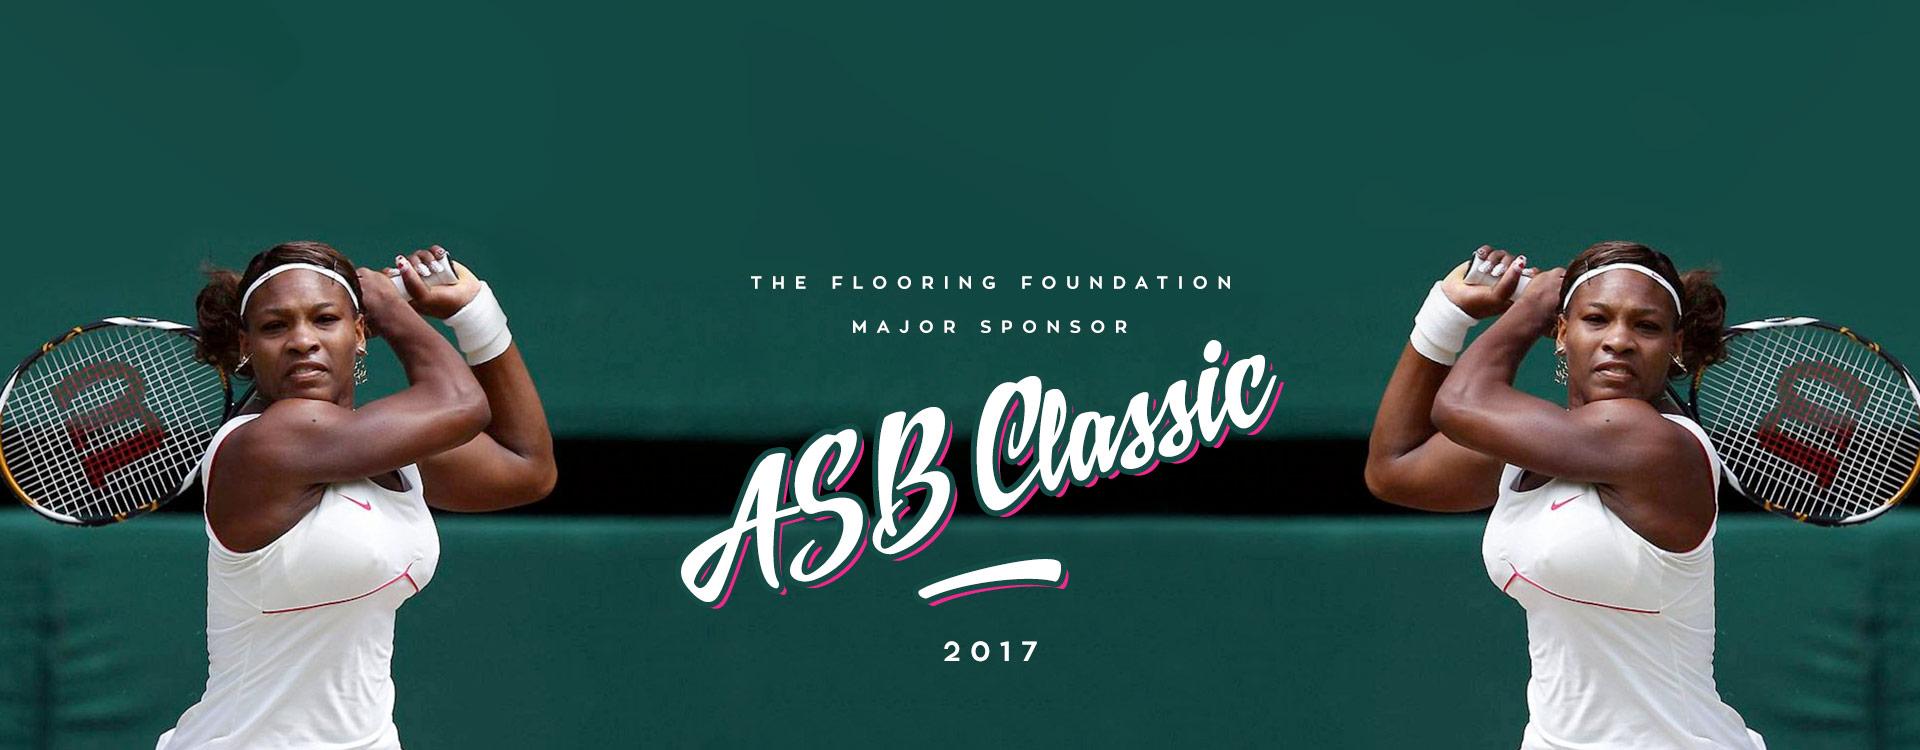 Serena Williams to headline at 2017 ASB Classic